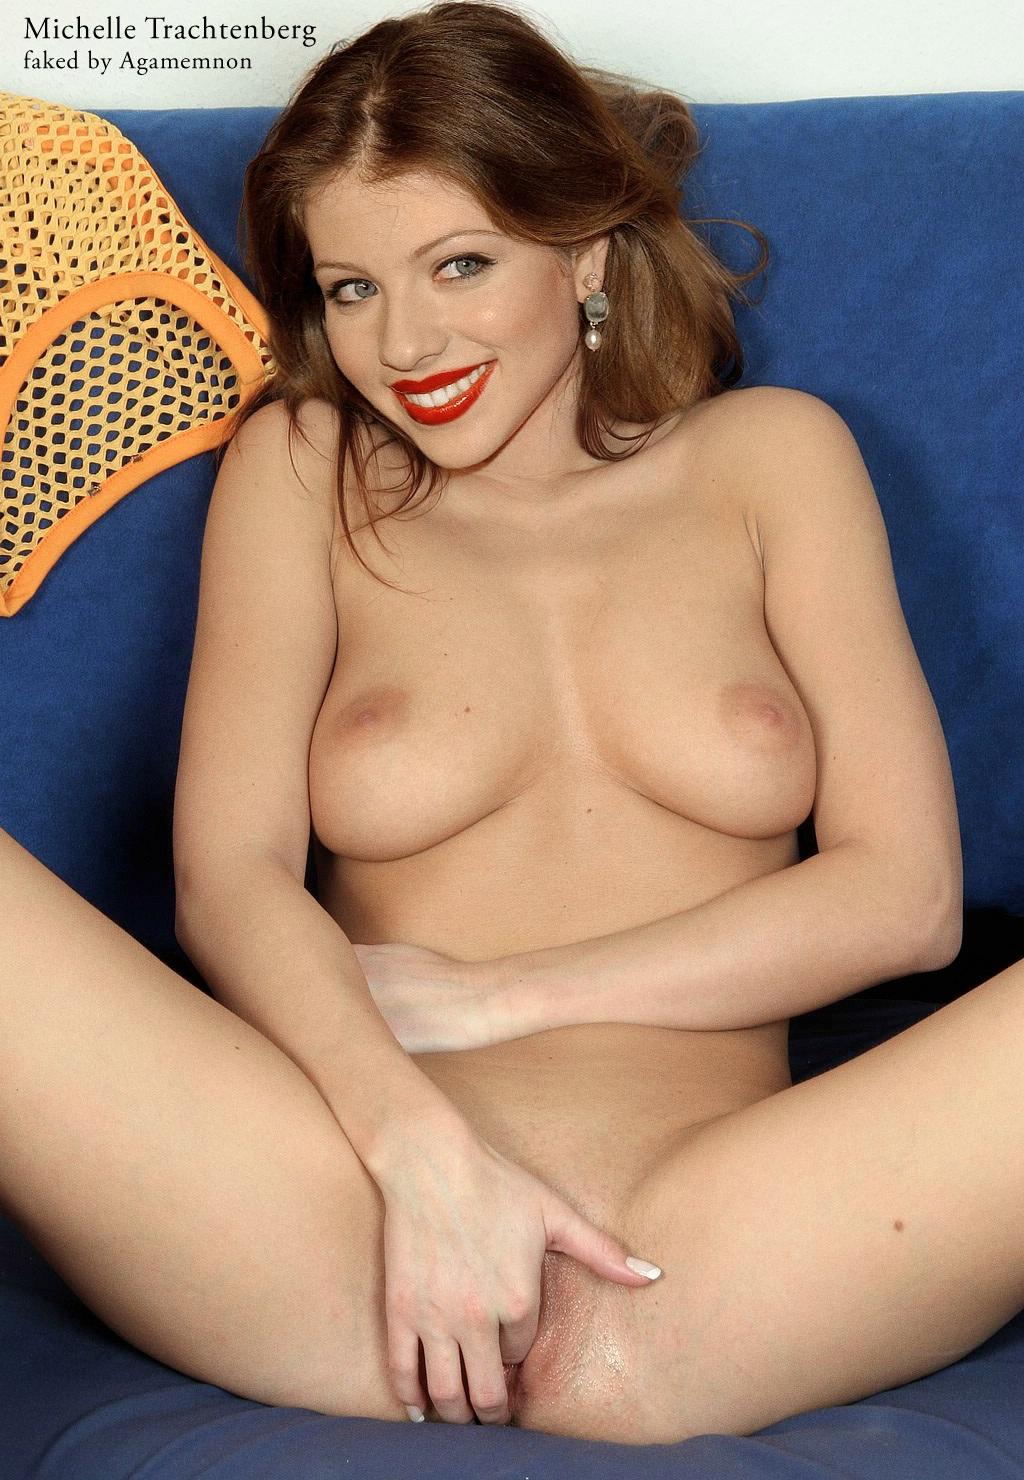 http://1.bp.blogspot.com/-TmgCwM4wOgE/T_Nppzxs0lI/AAAAAAAABCA/4J4A6DsOt0M/s1600/Fake+Michelle+Trachtenberg.74.jpg